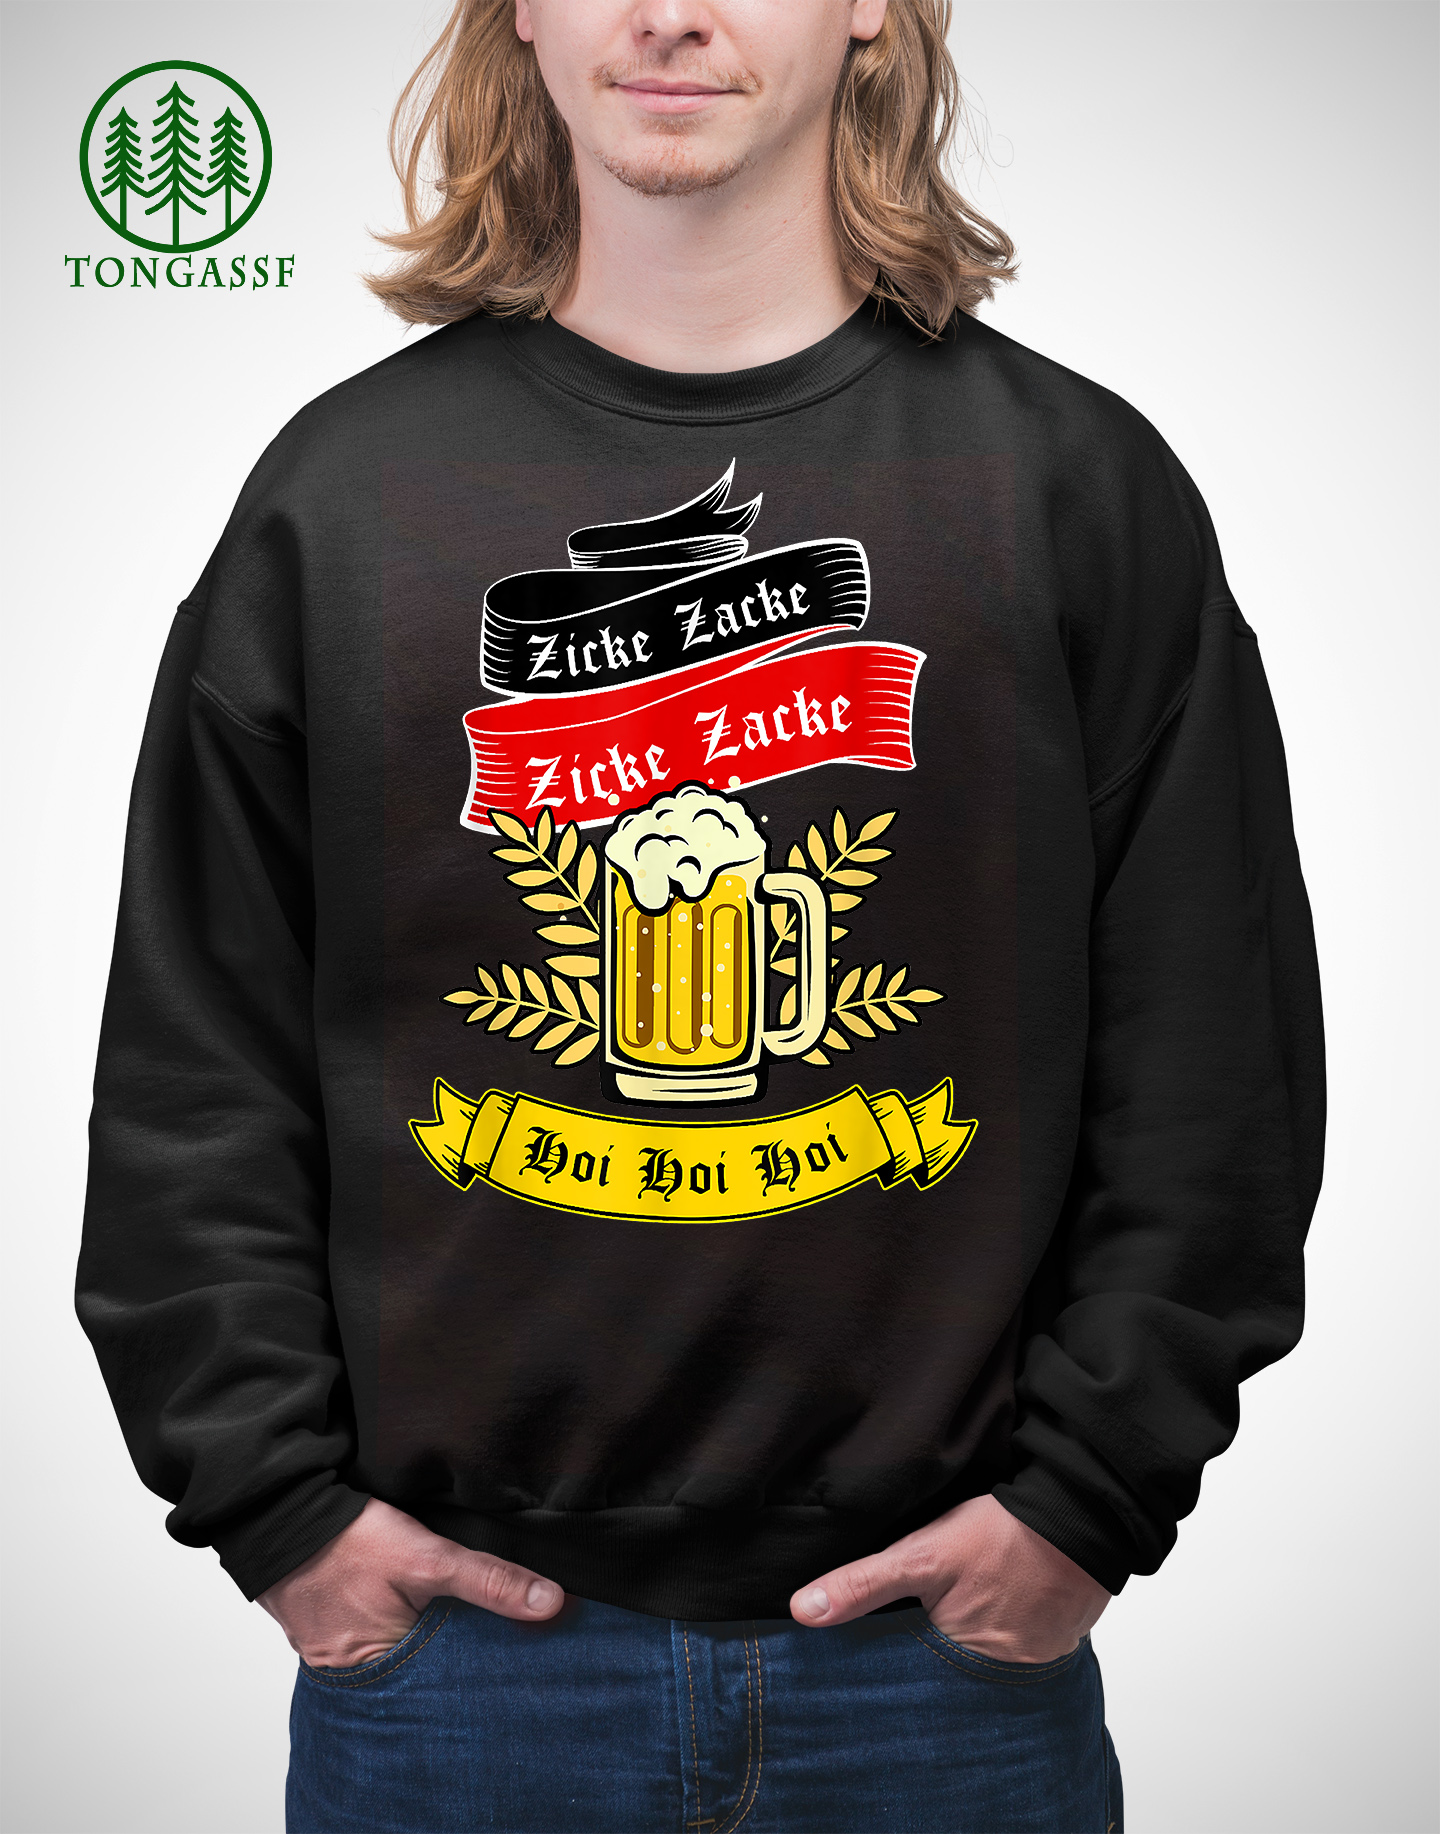 Zicke Zacke Hoi Funny Germany Flag Oktoberfest German Sweatshirt